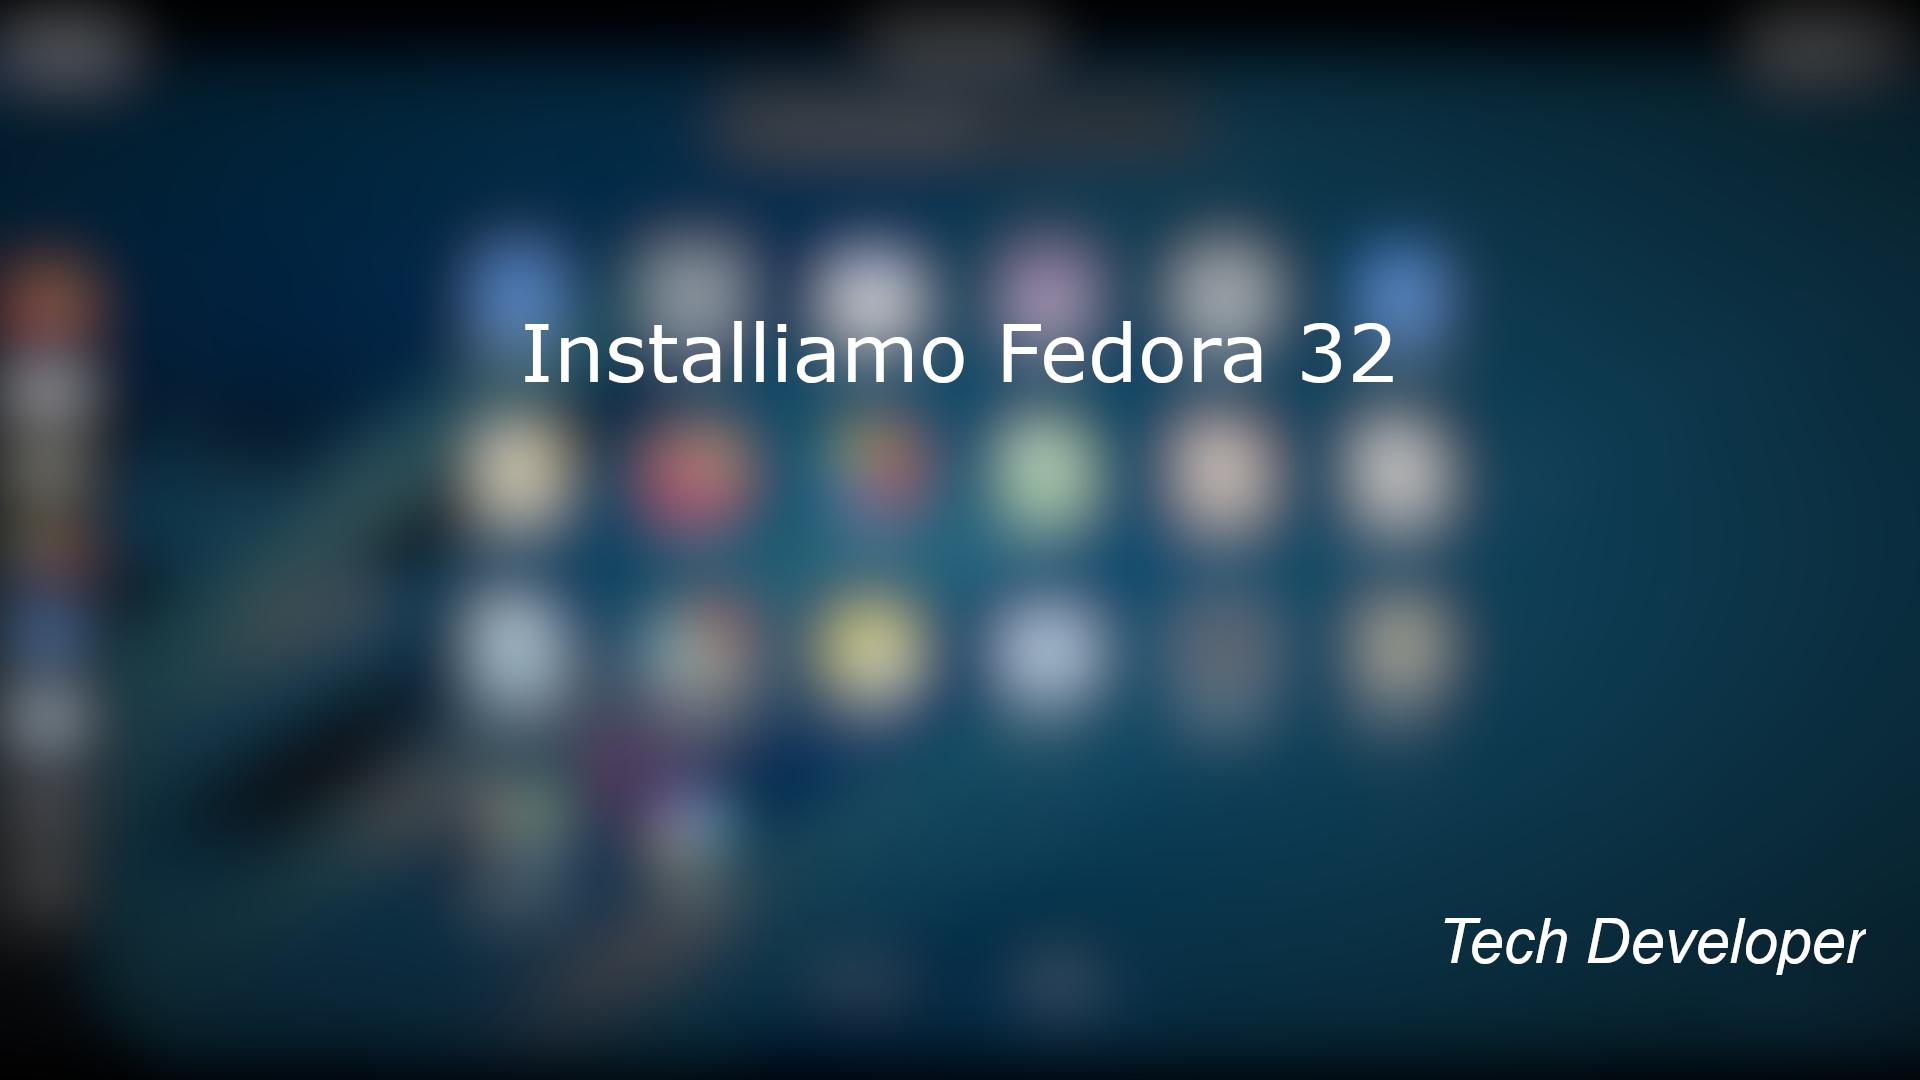 Installiamo Fedora 32 e configuriamola insieme